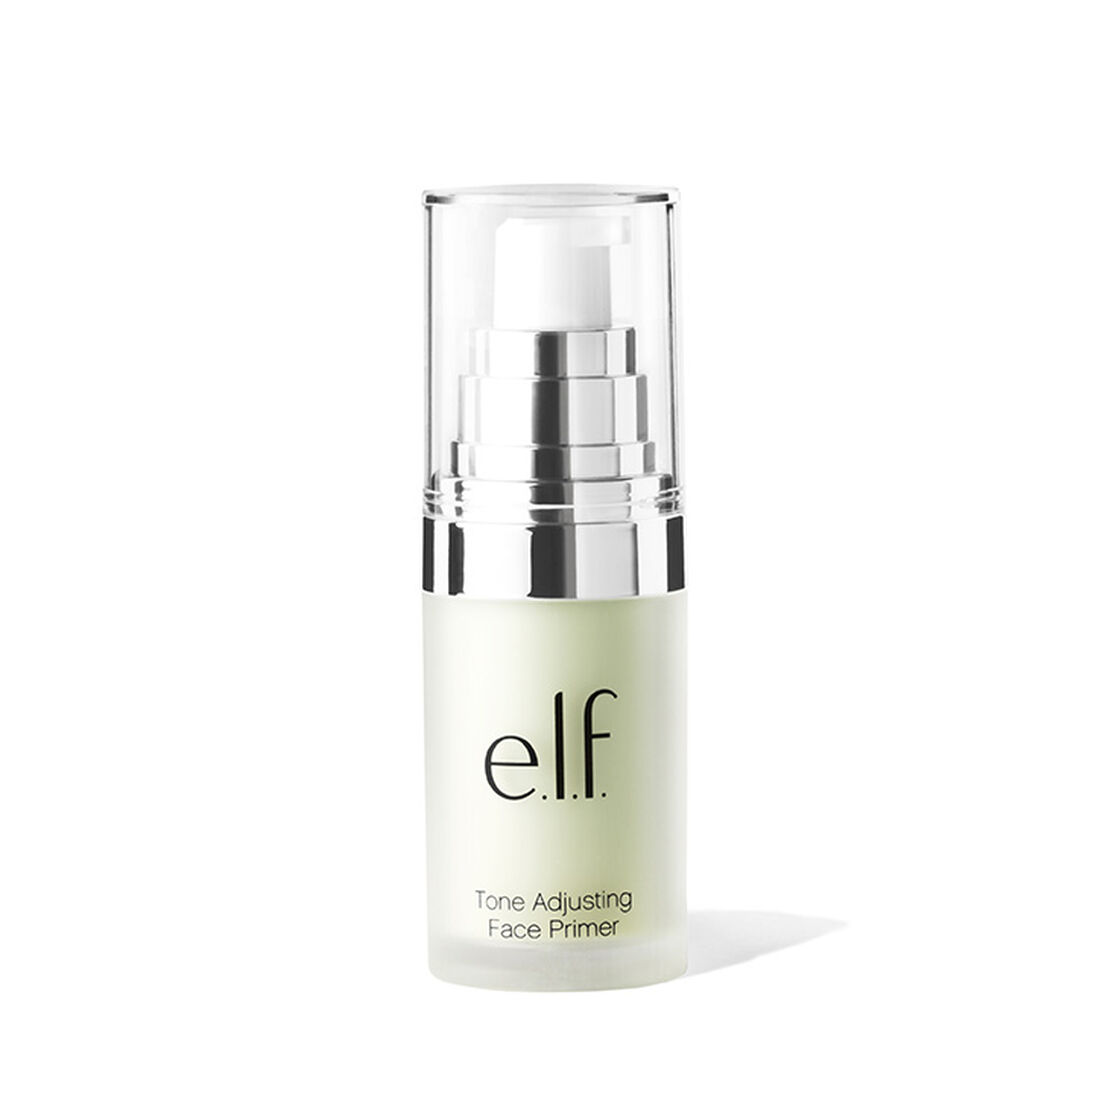 e.l.f. Cosmetics Tone Adjusting Face Primer